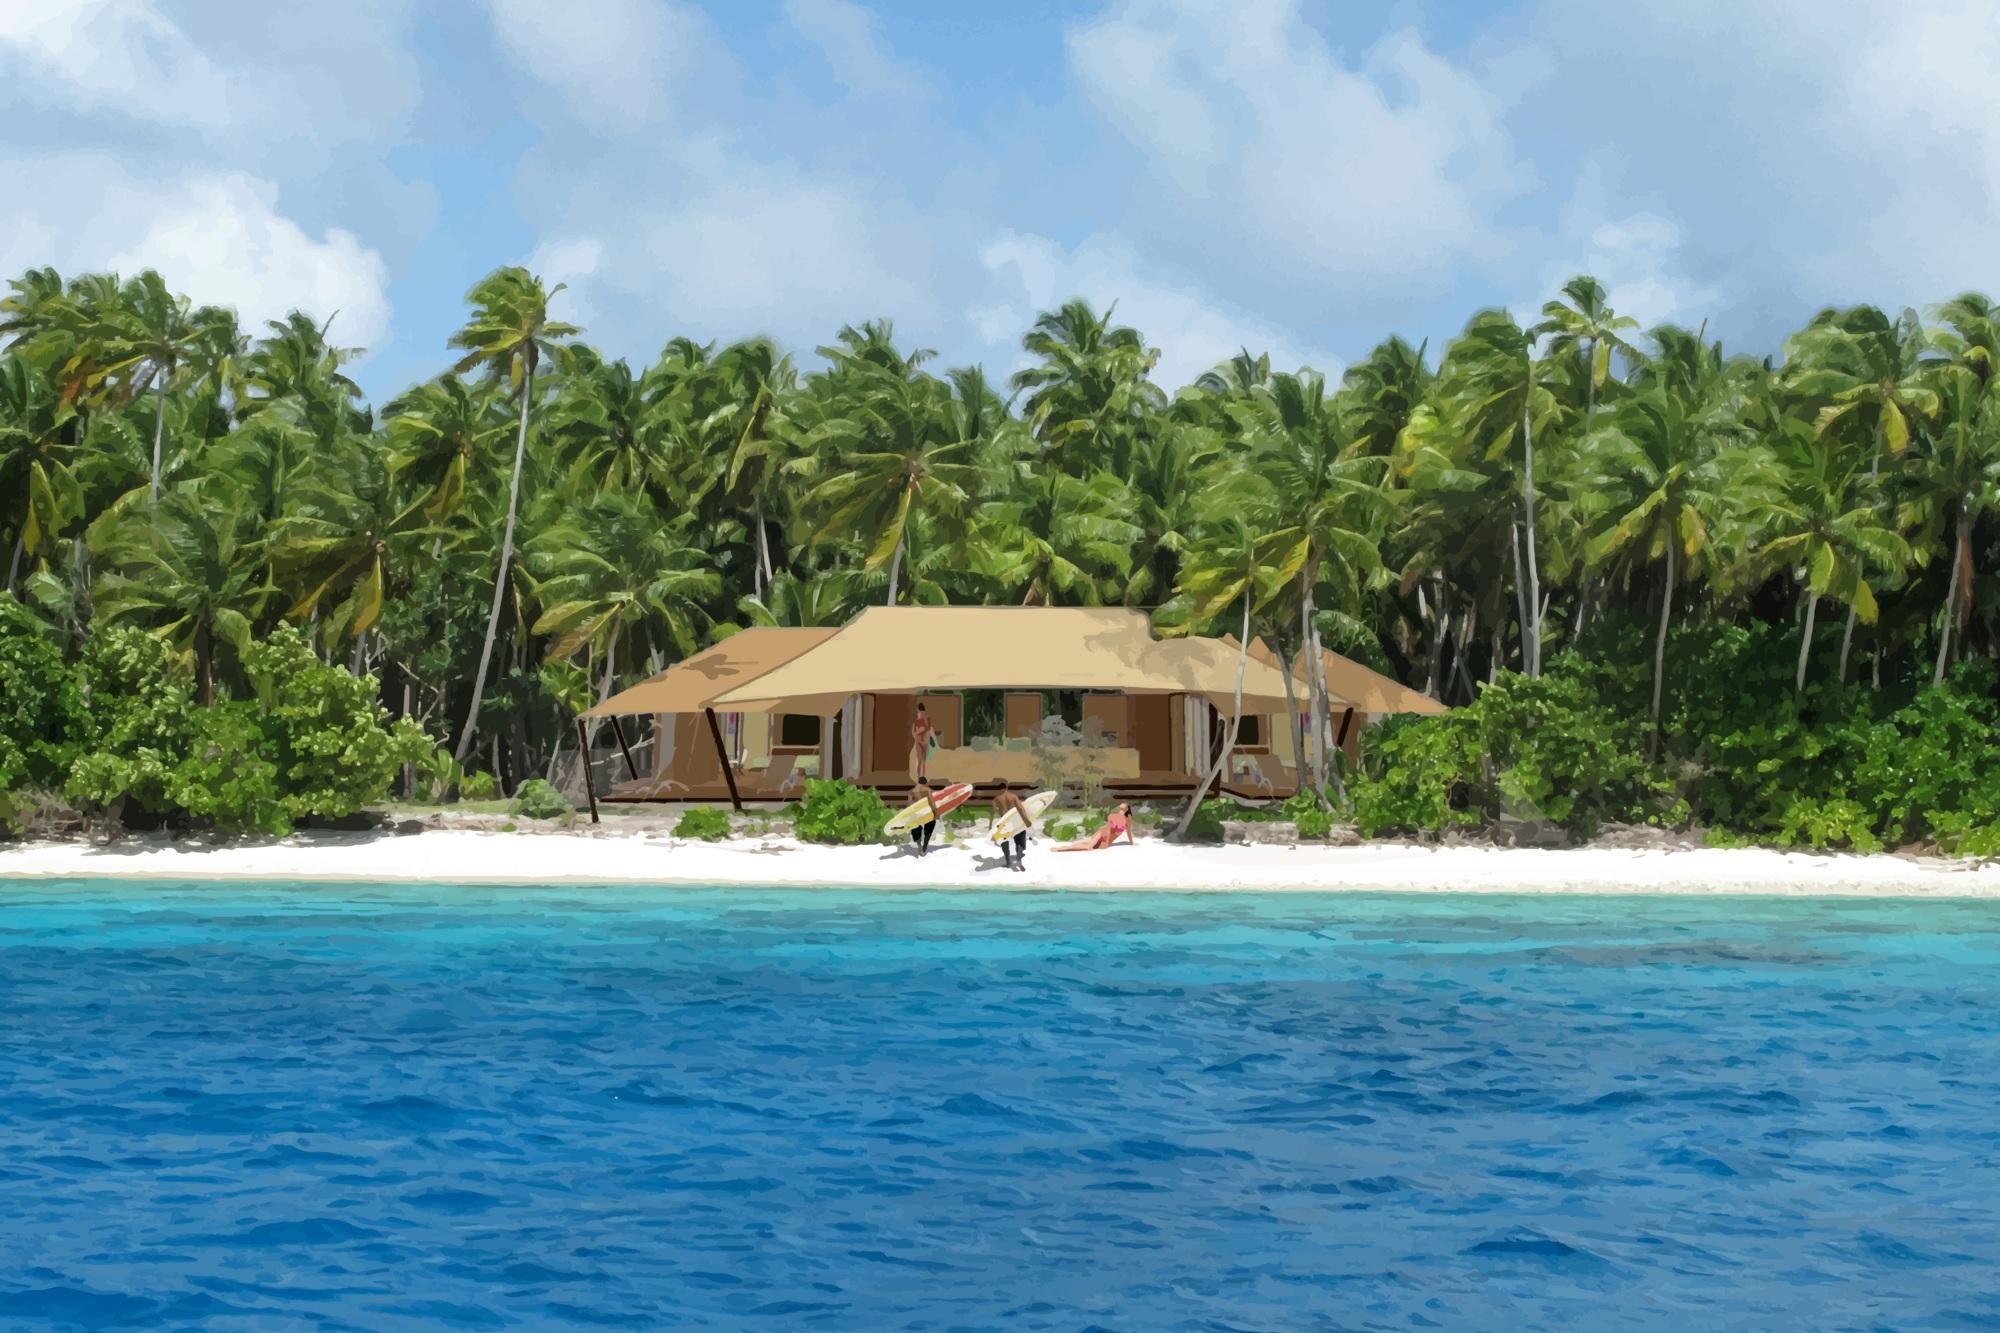 S.E.A.-Studio-Environmental-Architecture-David-Hertz-FAIA-Beran-East-Indies-Trader-Watermans-Resort-Papua-New-Guinea-sustainable-regenerative-restorative-green-design-hospitality-tropical-resort-hotel-biomimetic-tensile-structure-site-render-1.jpg